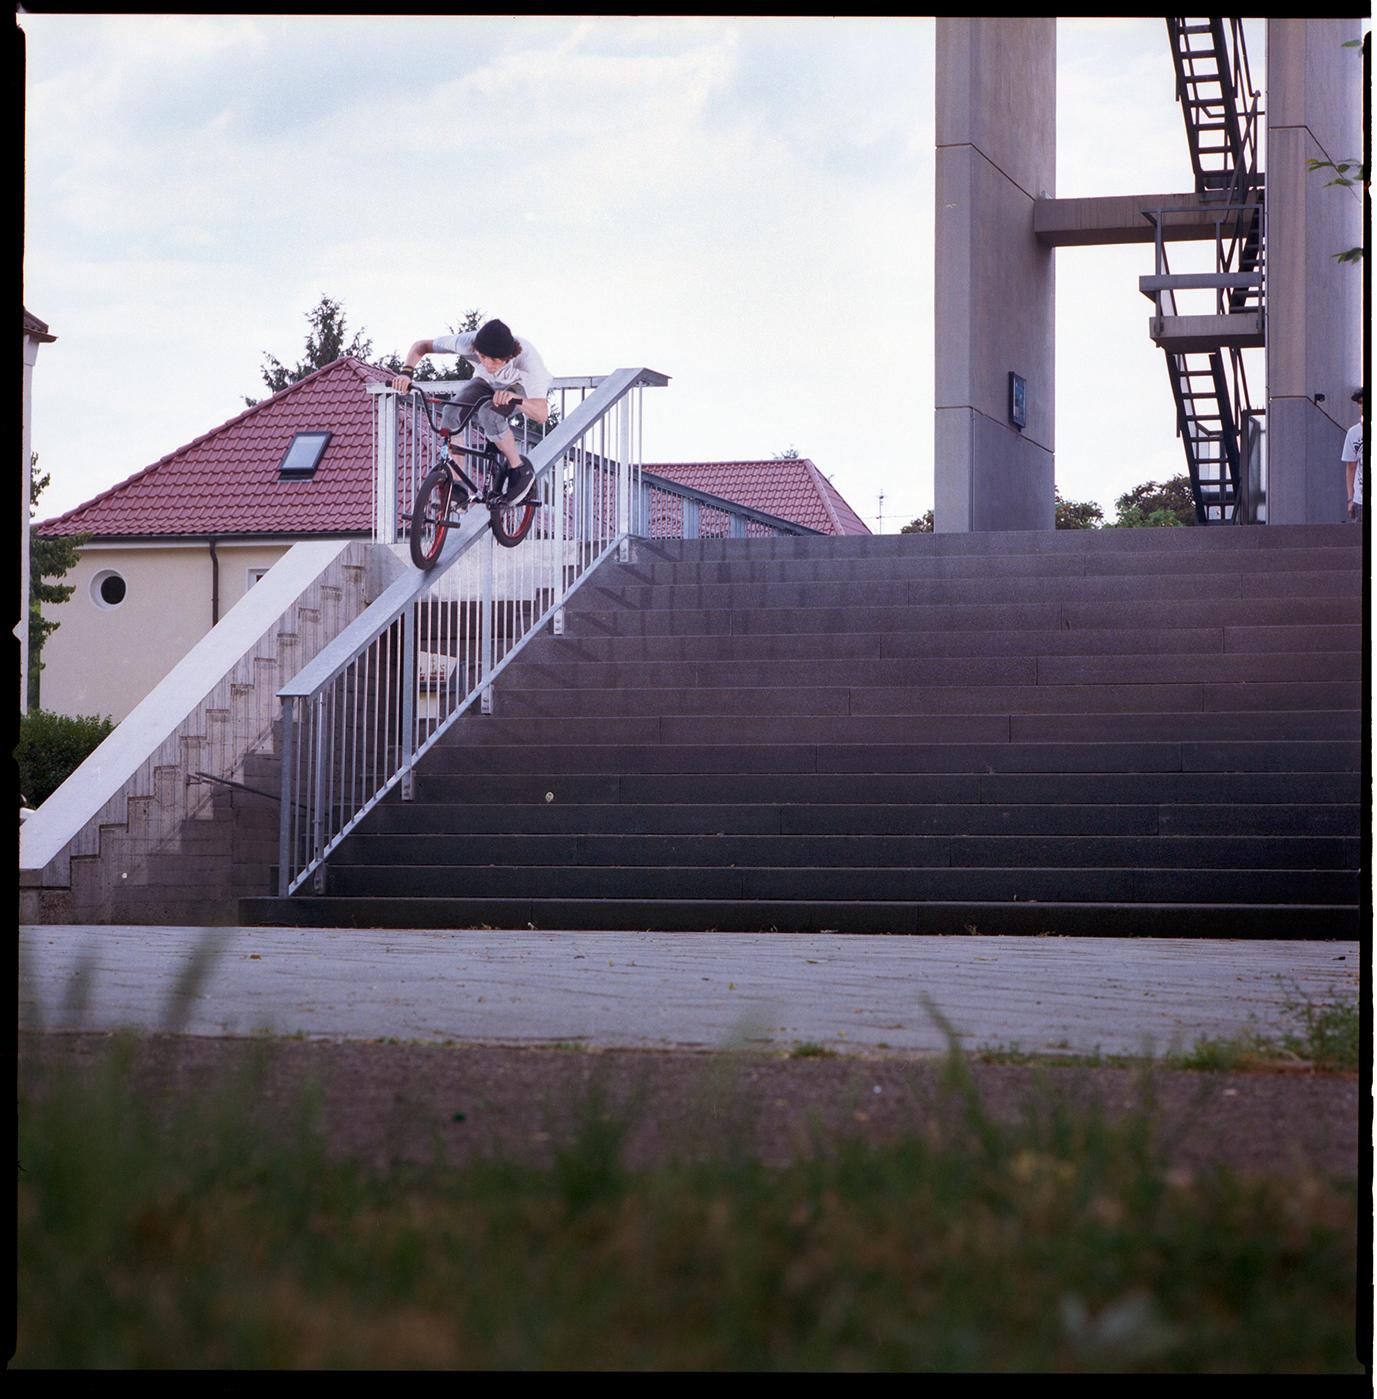 Bruno Hoffmann Feeble Grind Rail